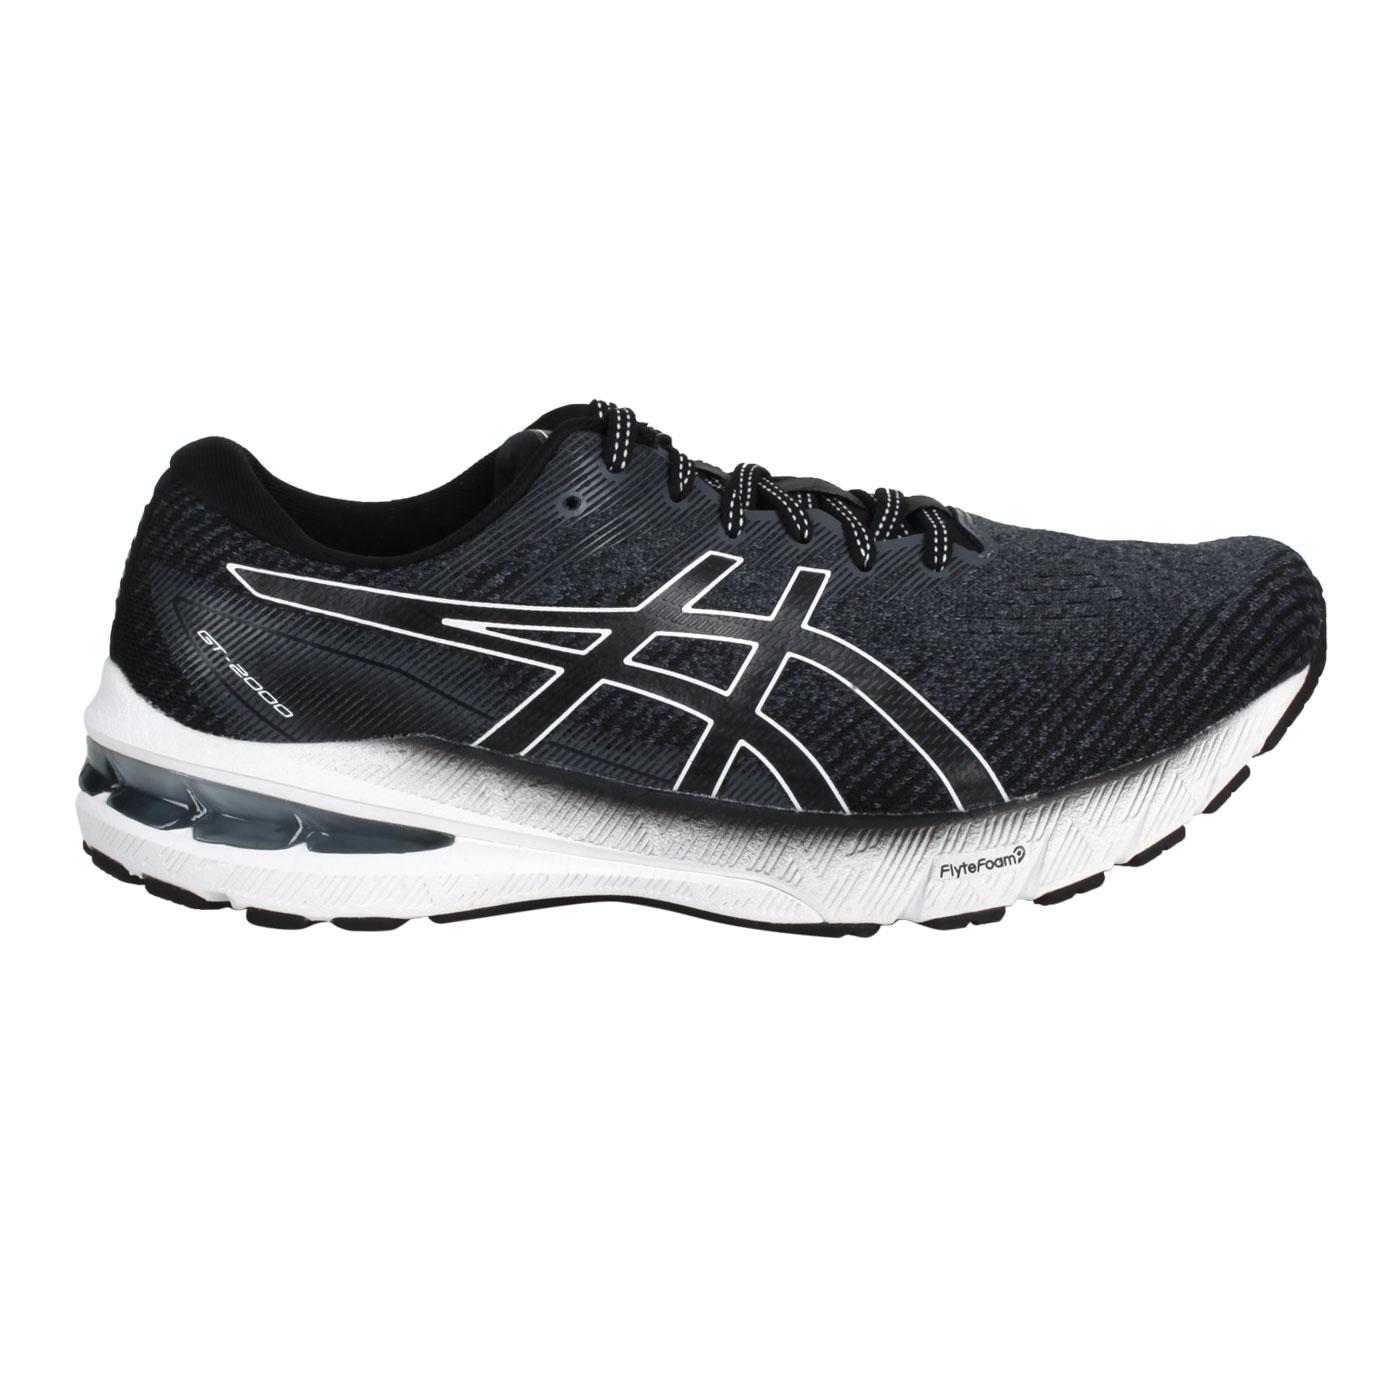 ASICS 男款慢跑鞋-4E  @GT-2000 10@1011B184-002